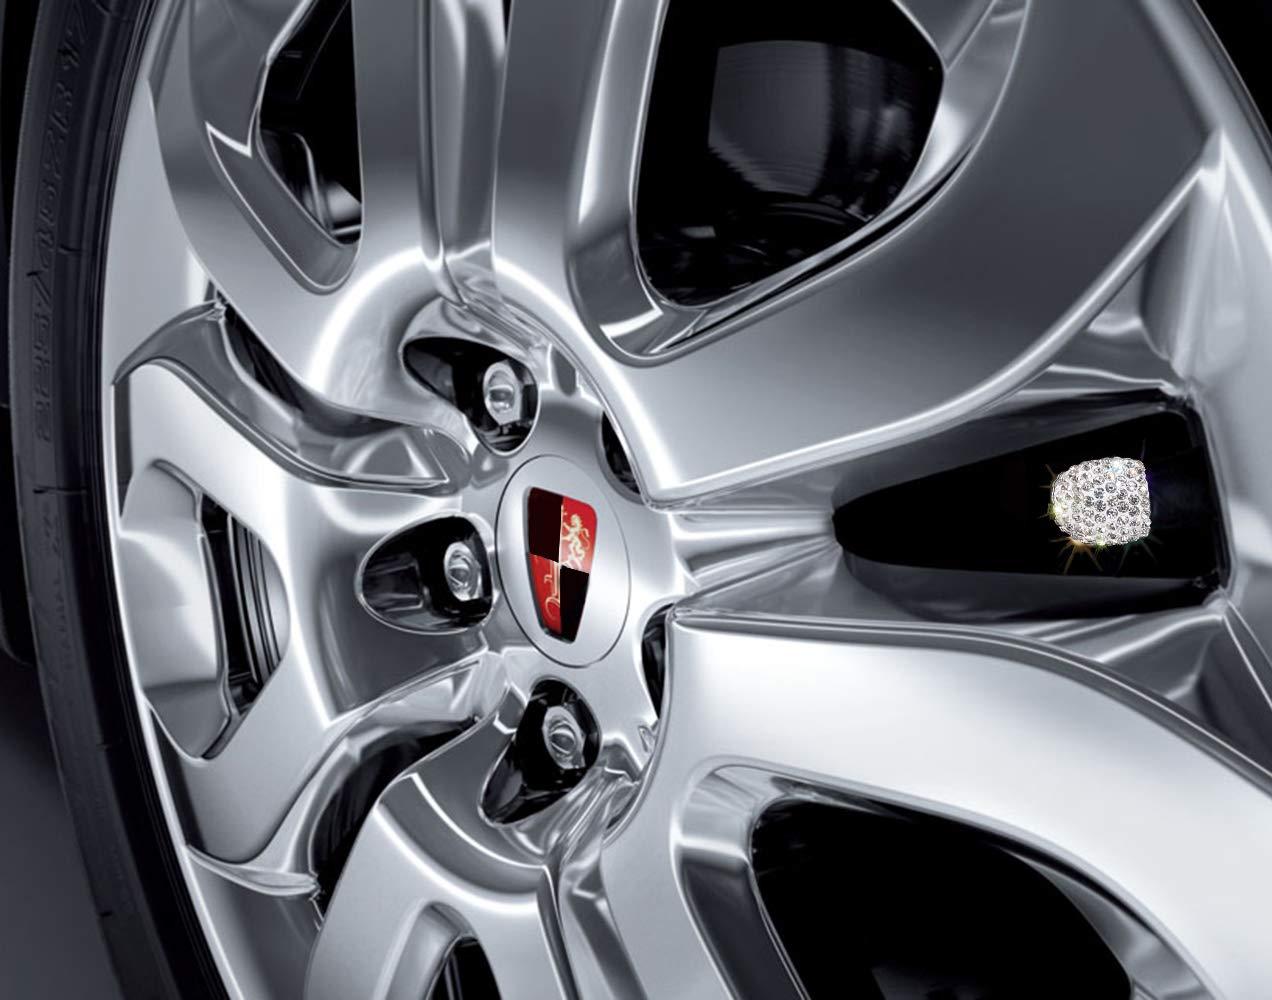 4 Pack Handmade Rhinestone Tire Valve Caps Crystal Universal Tire Caps for Car Wheels Pink QBeel Valve Stem Caps